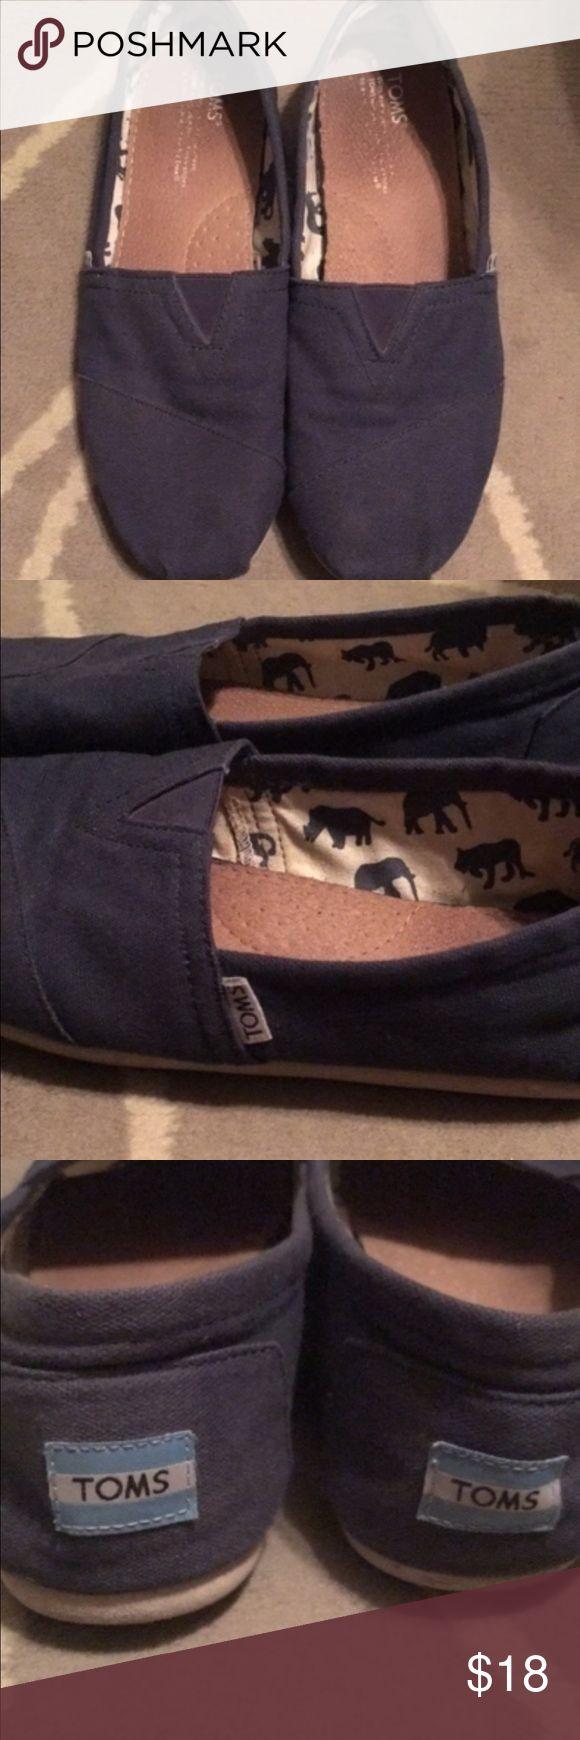 Men's navy blue TOMS Size 9. Men's navy blue gently worn TOMS TOMS Shoes Loafers & Slip-Ons